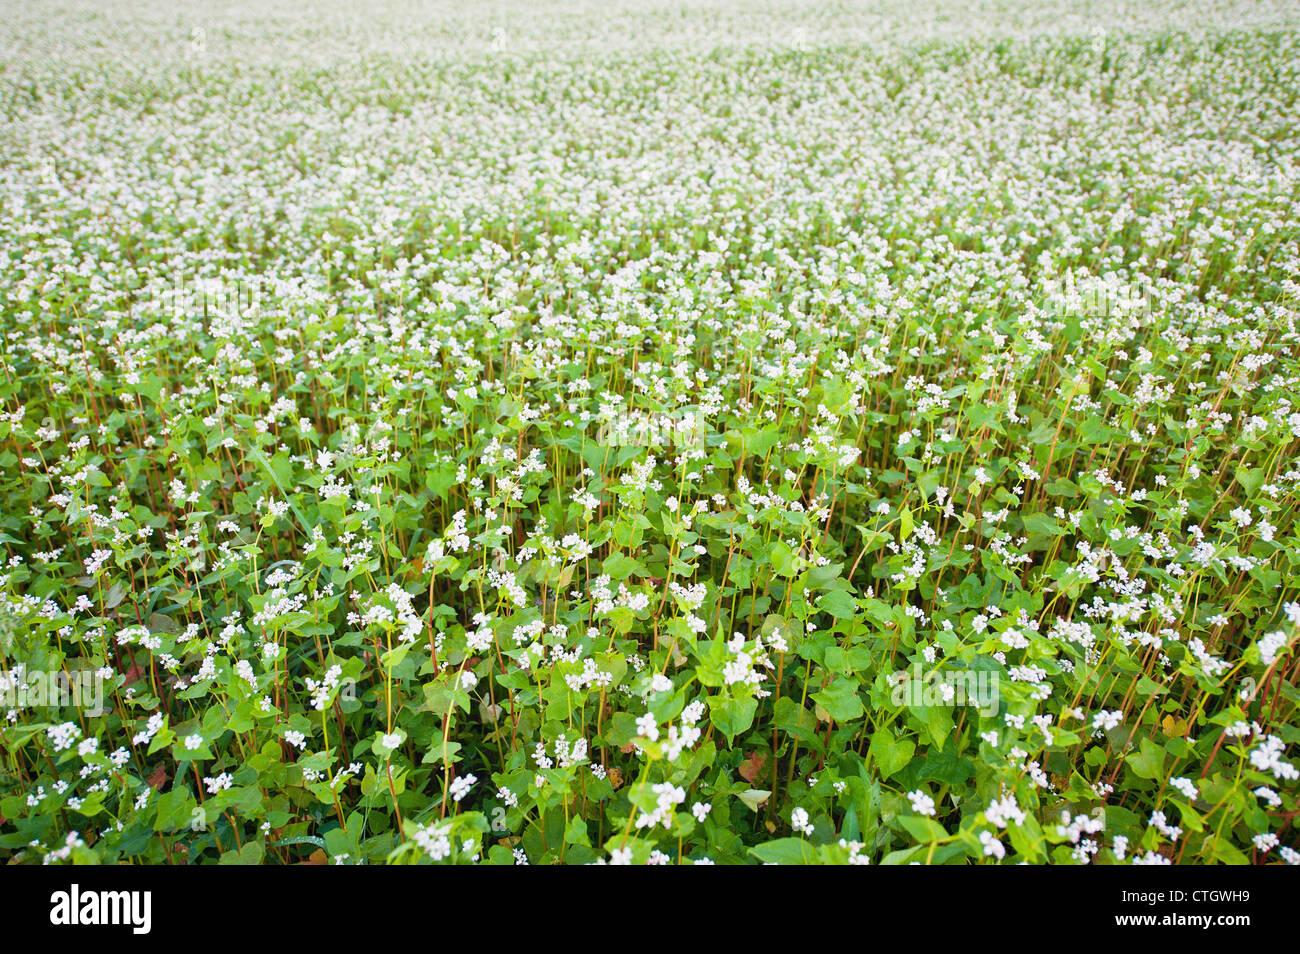 Field Buckwheat White Flowers Stock Photos Field Buckwheat White